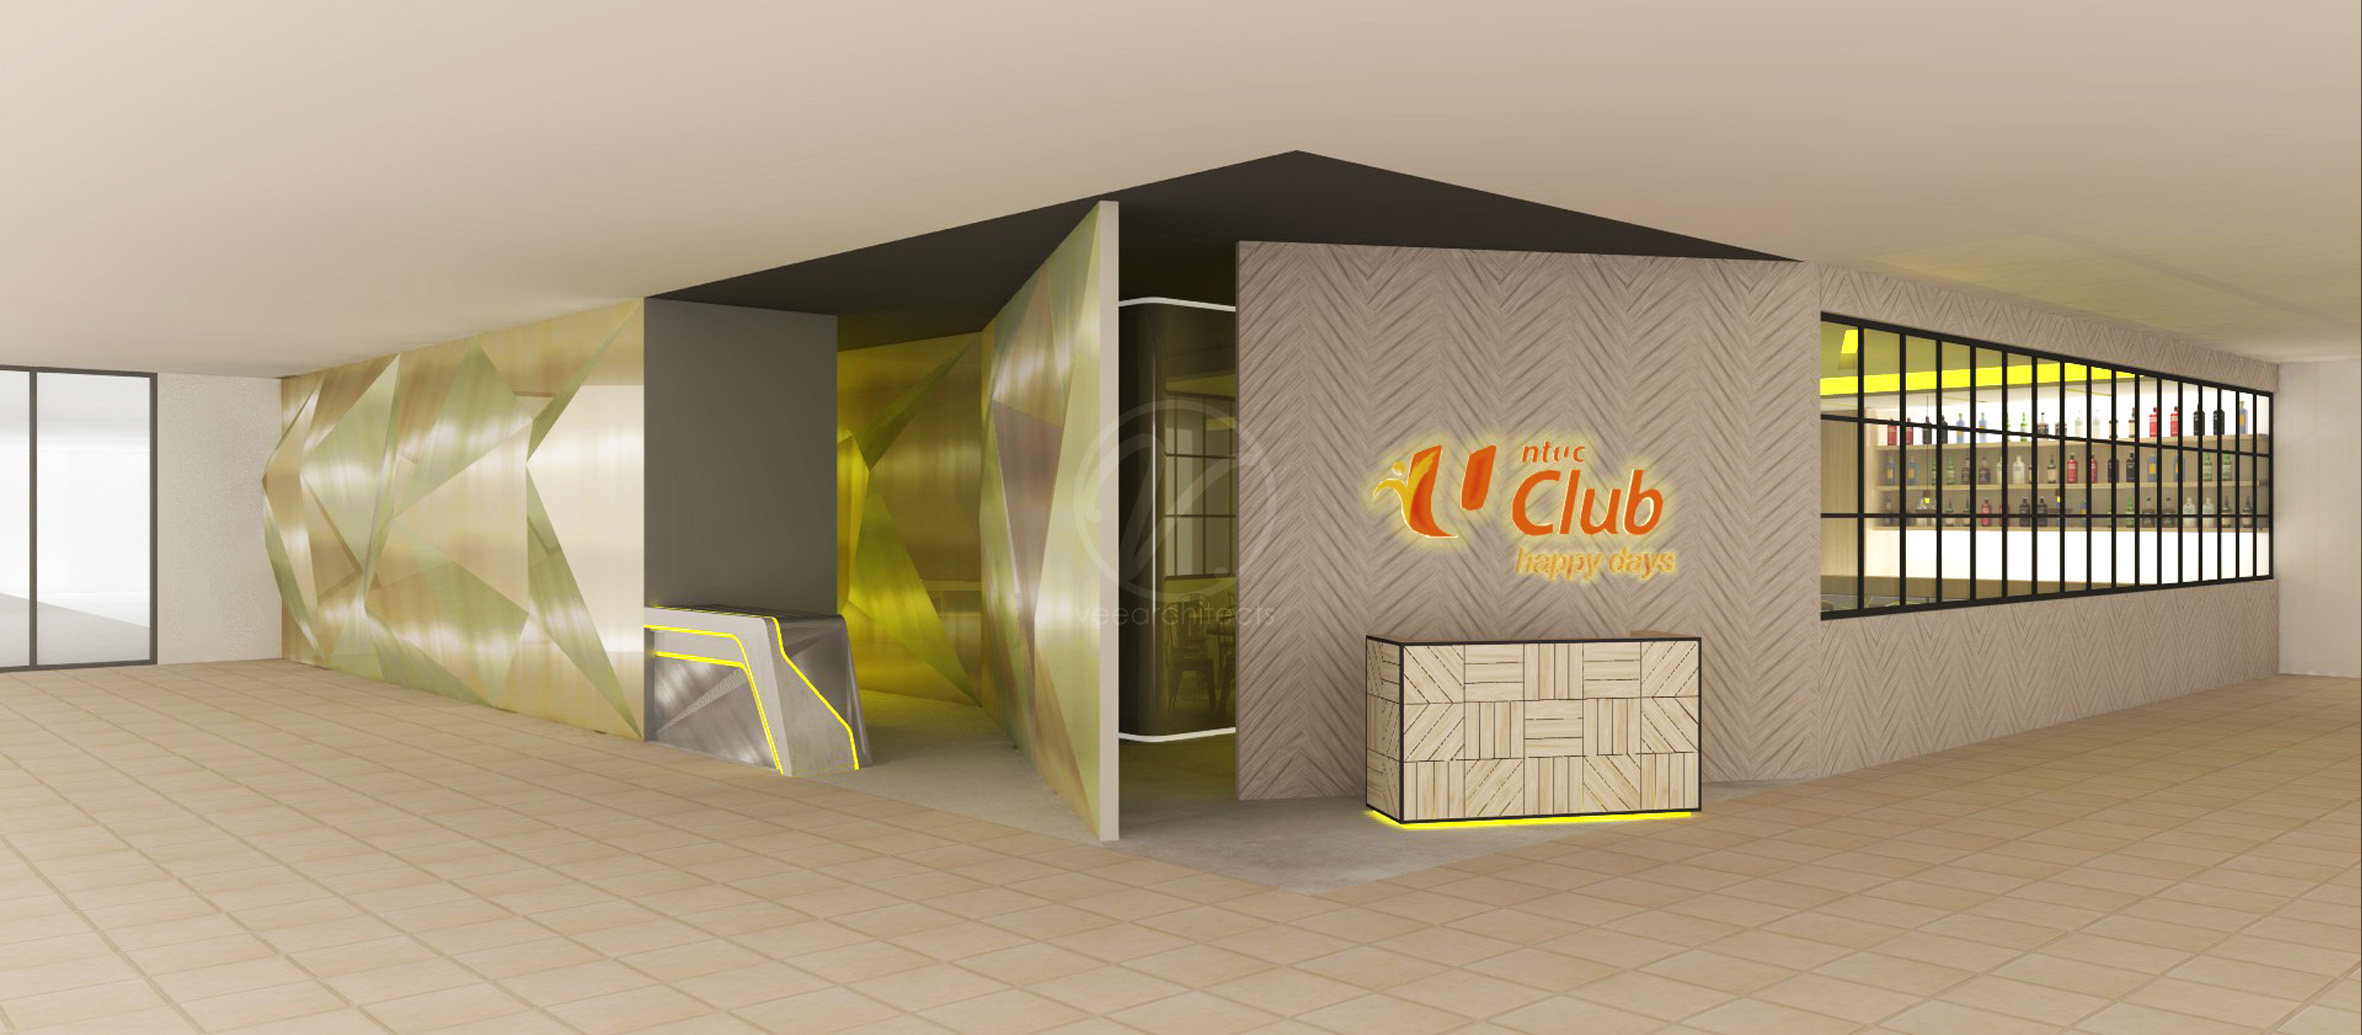 ntuc clubhouse @ bedok